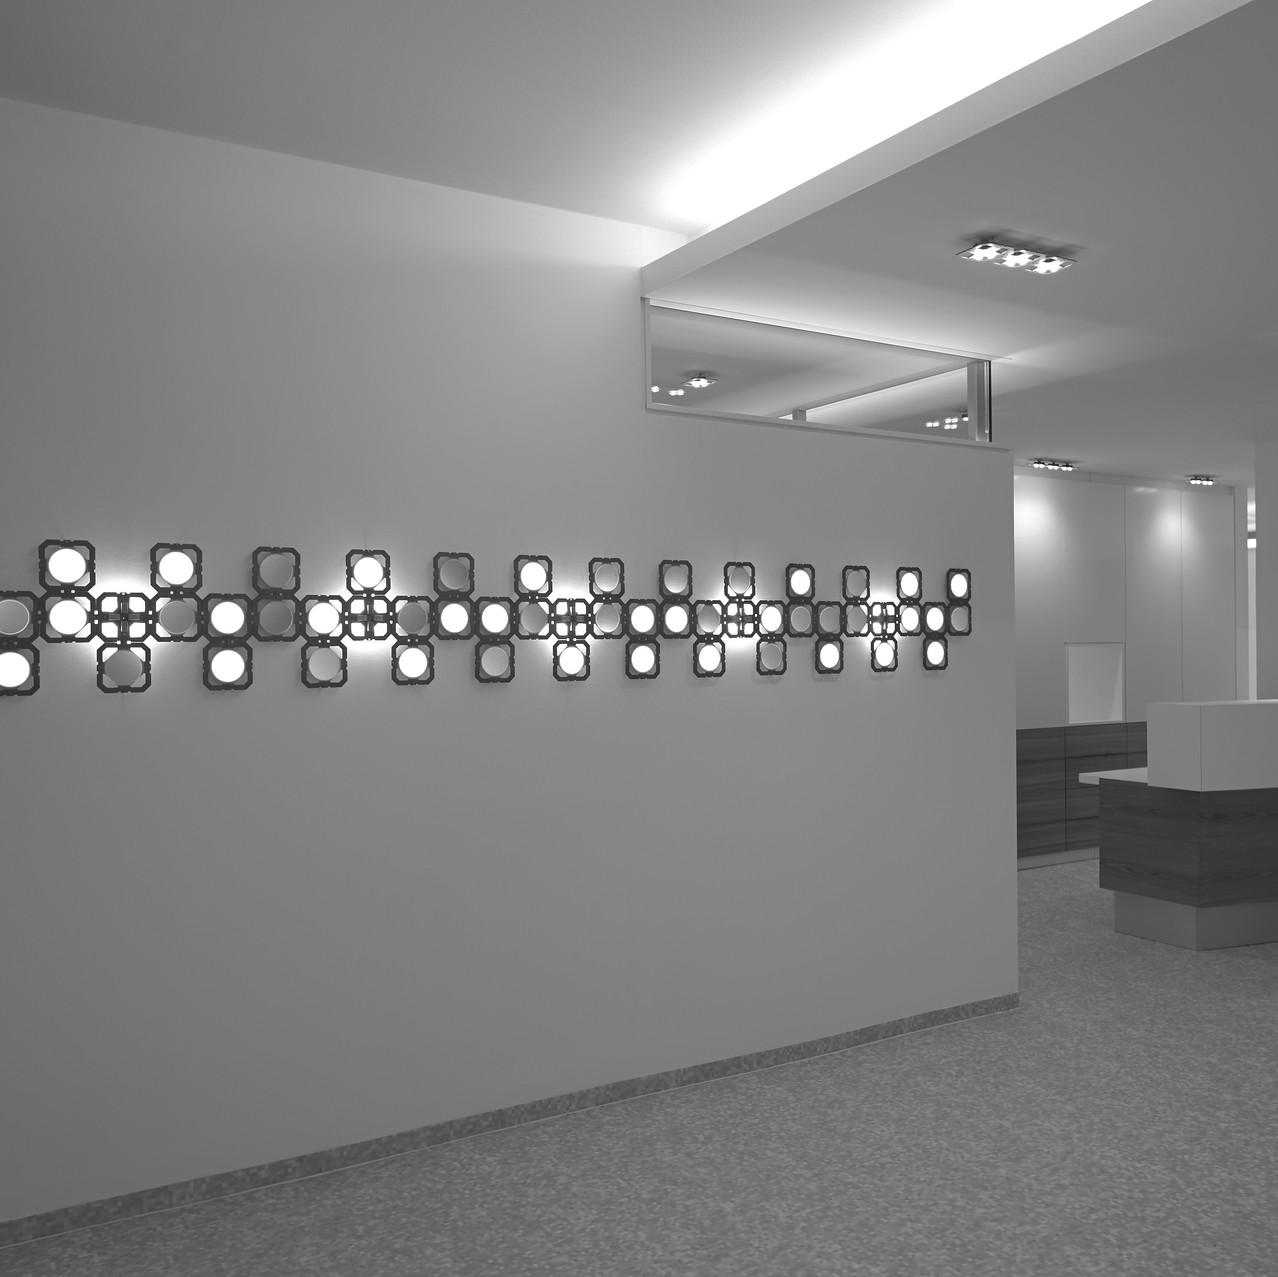 LED_OLED_Installation_Foto_Andreas_Reitersw Kopie-viele-an